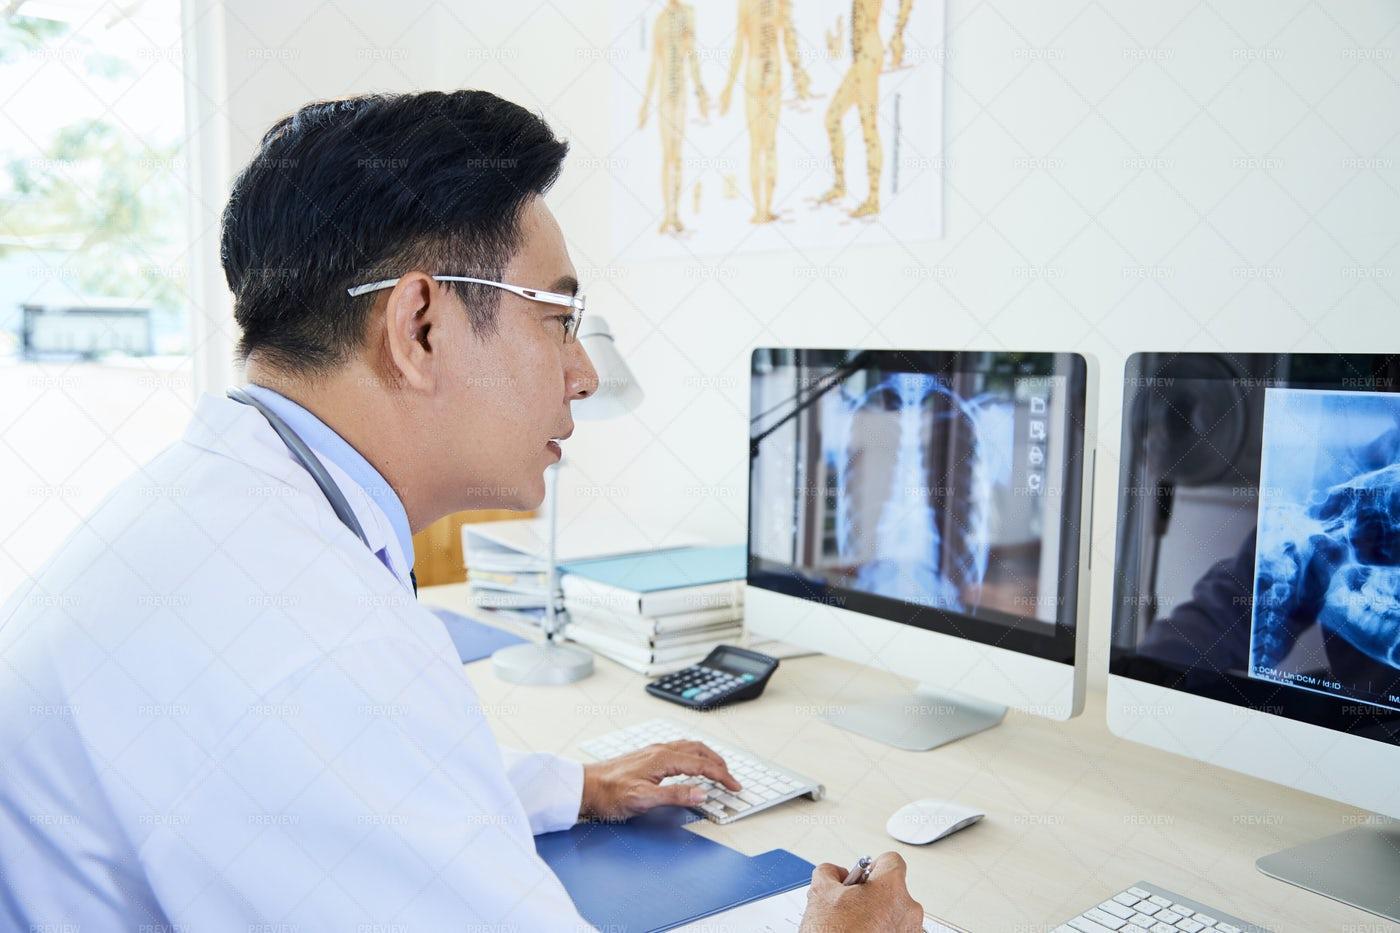 Mature Doctor Examining X-ray Image: Stock Photos